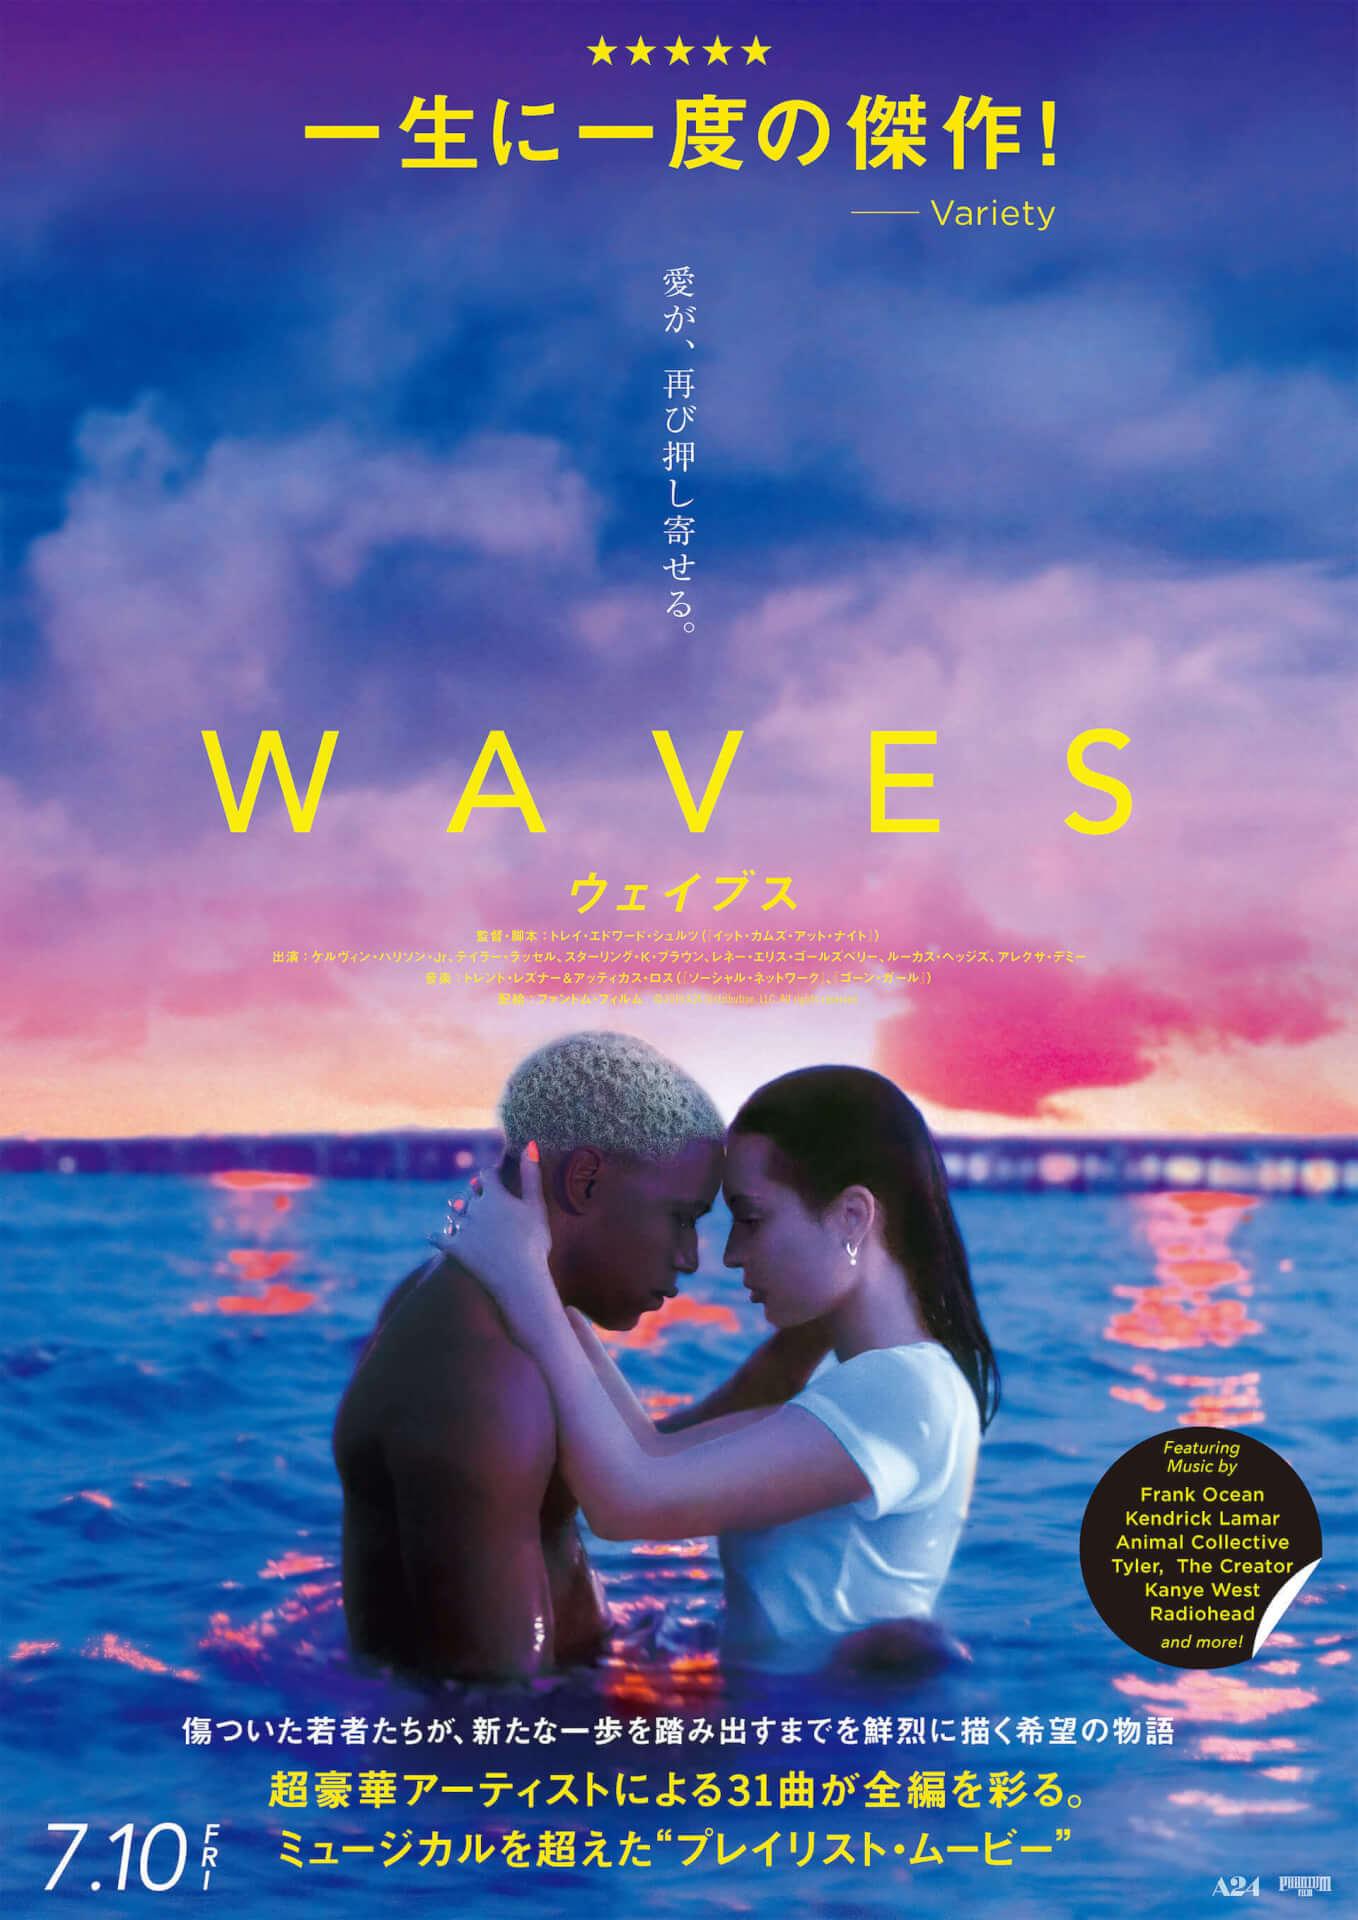 A24最新作『WAVES/ウェイブス』に監督&キャスト陣がかけた想いとは...インタビュー特別編集映像が解禁 film200711_waves_3